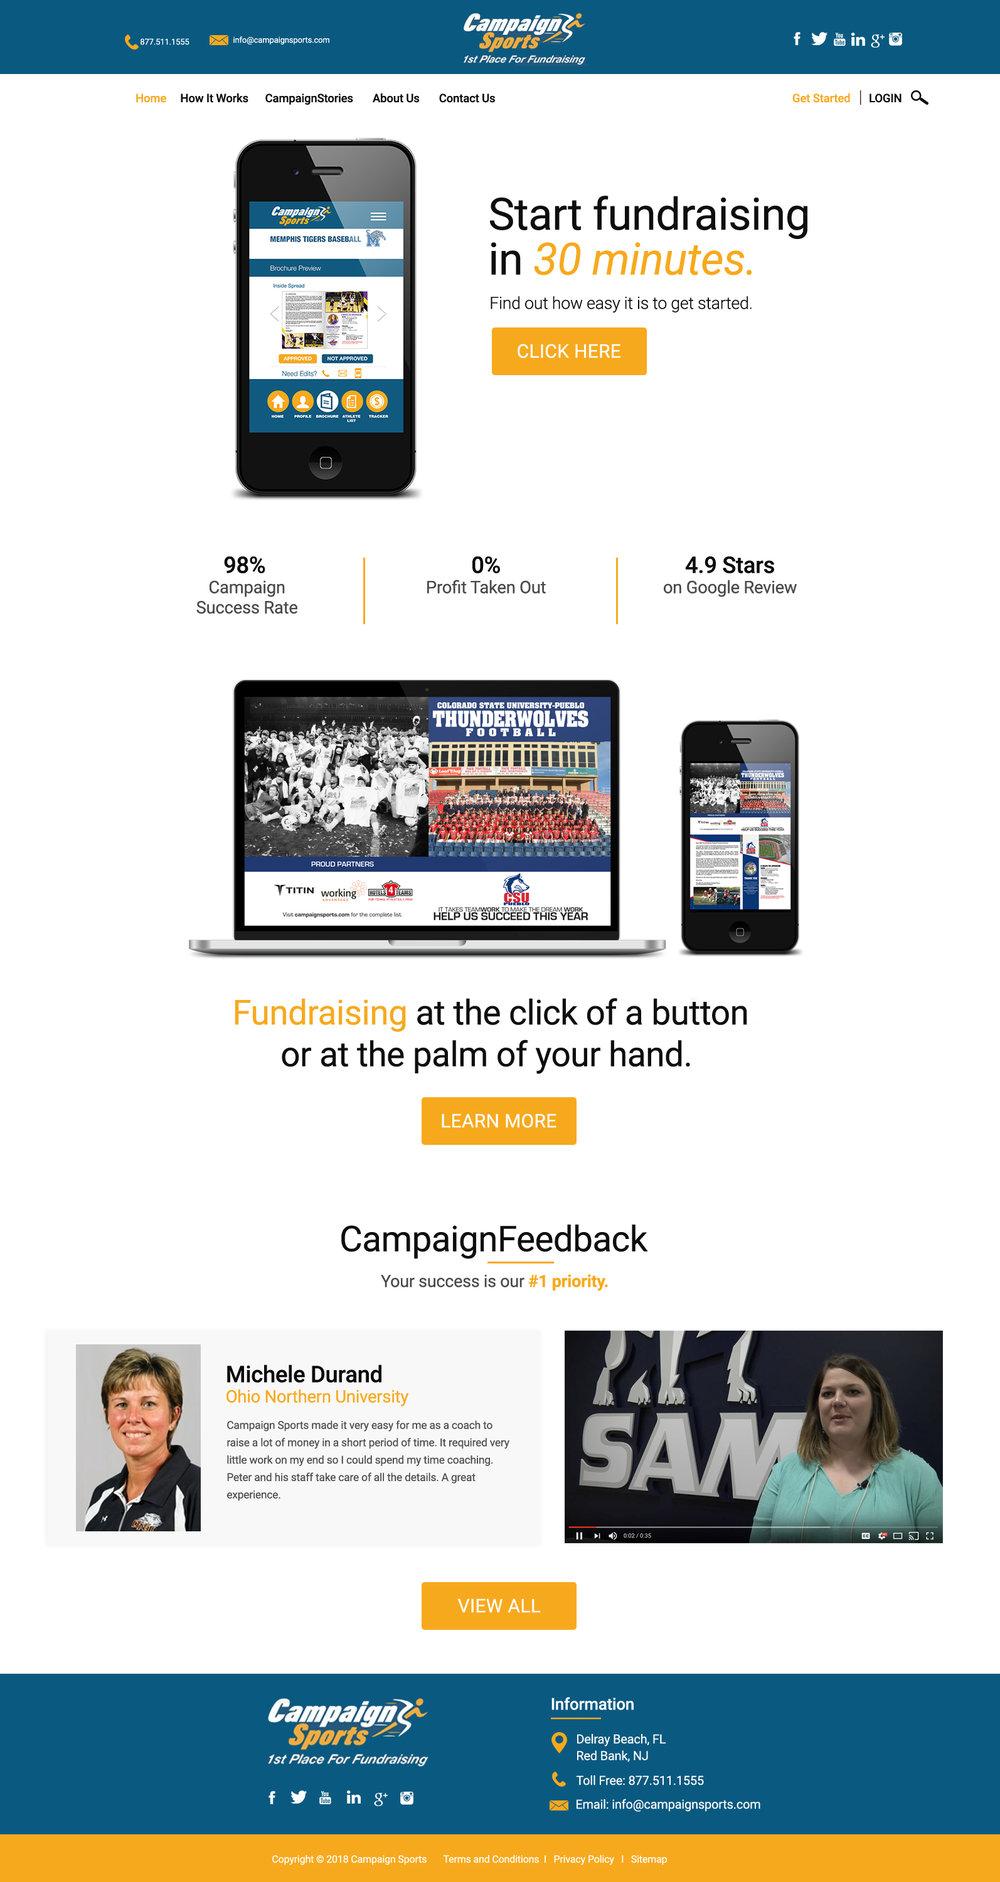 Campaignsports.jpg